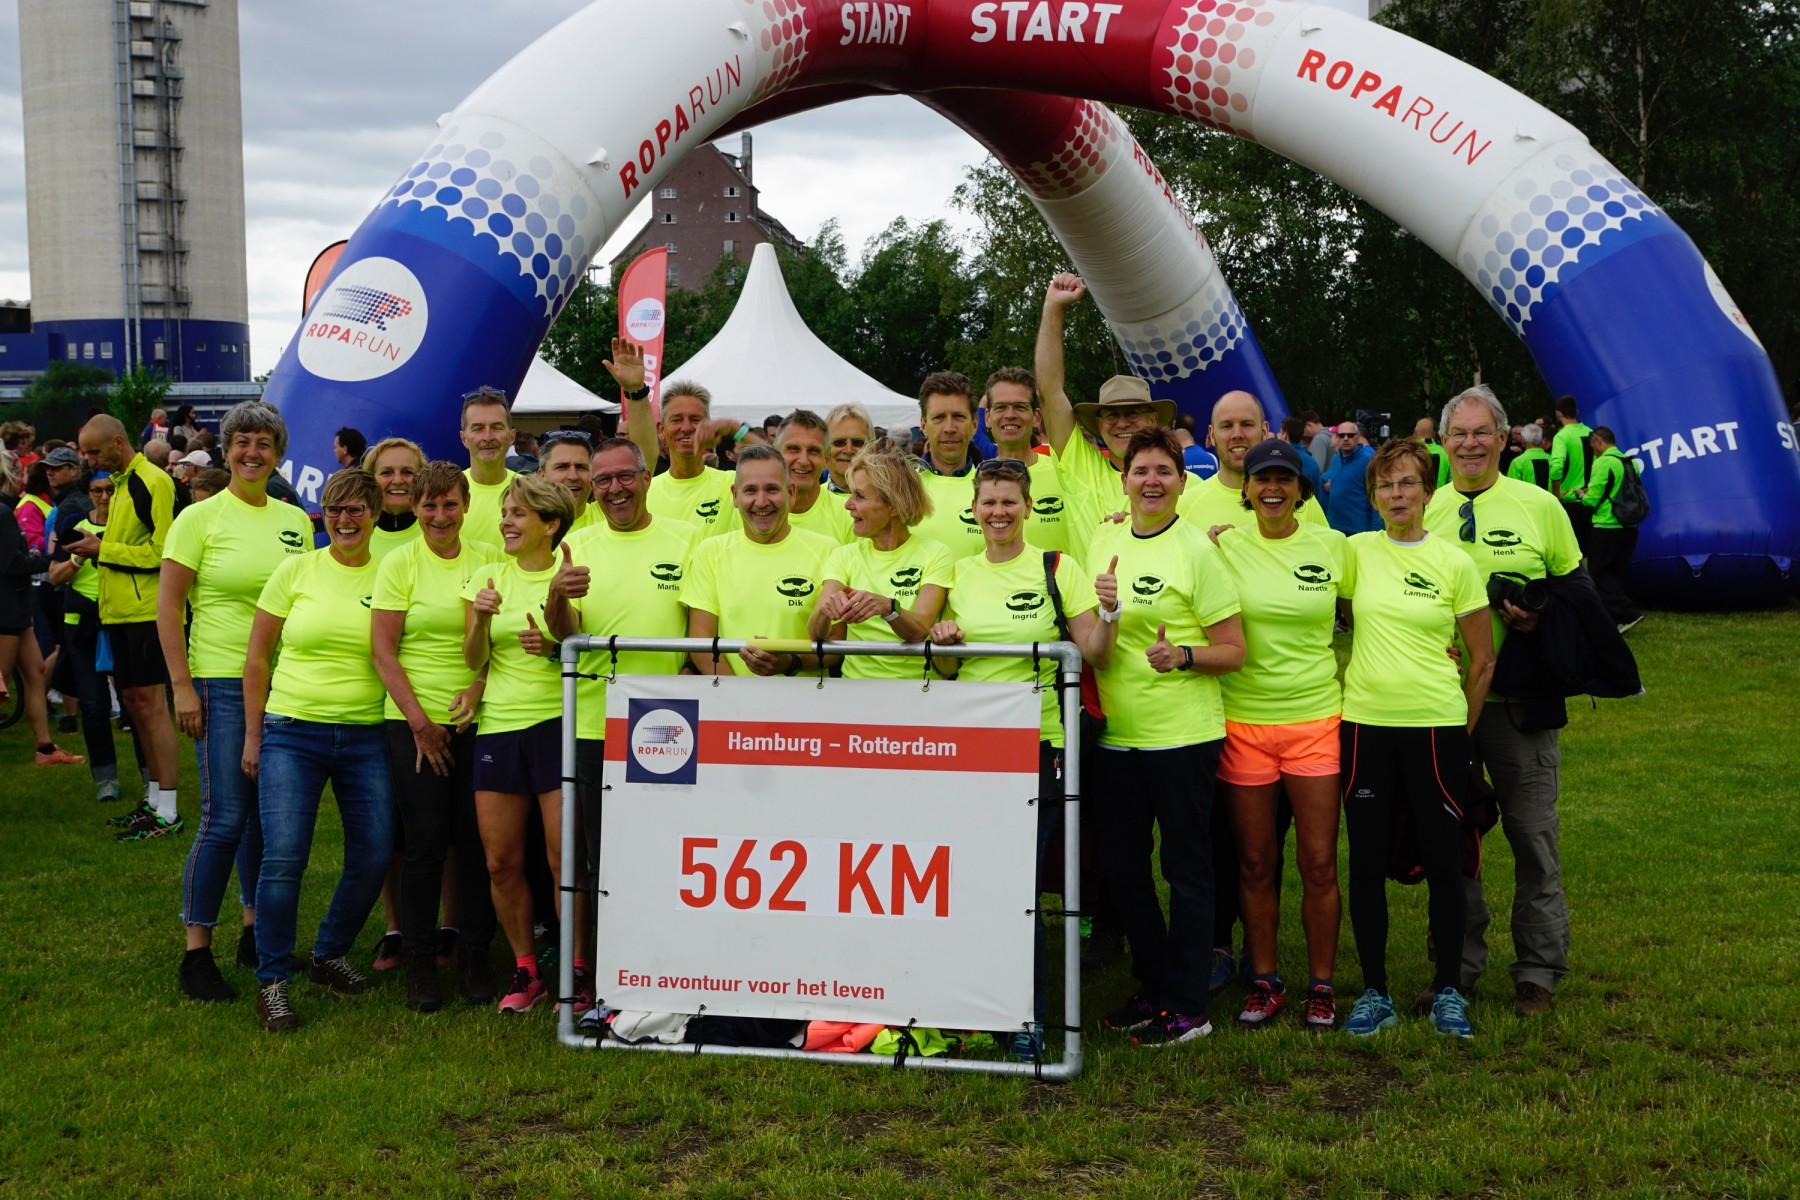 Foto team Turfrunners start Roparun 2019